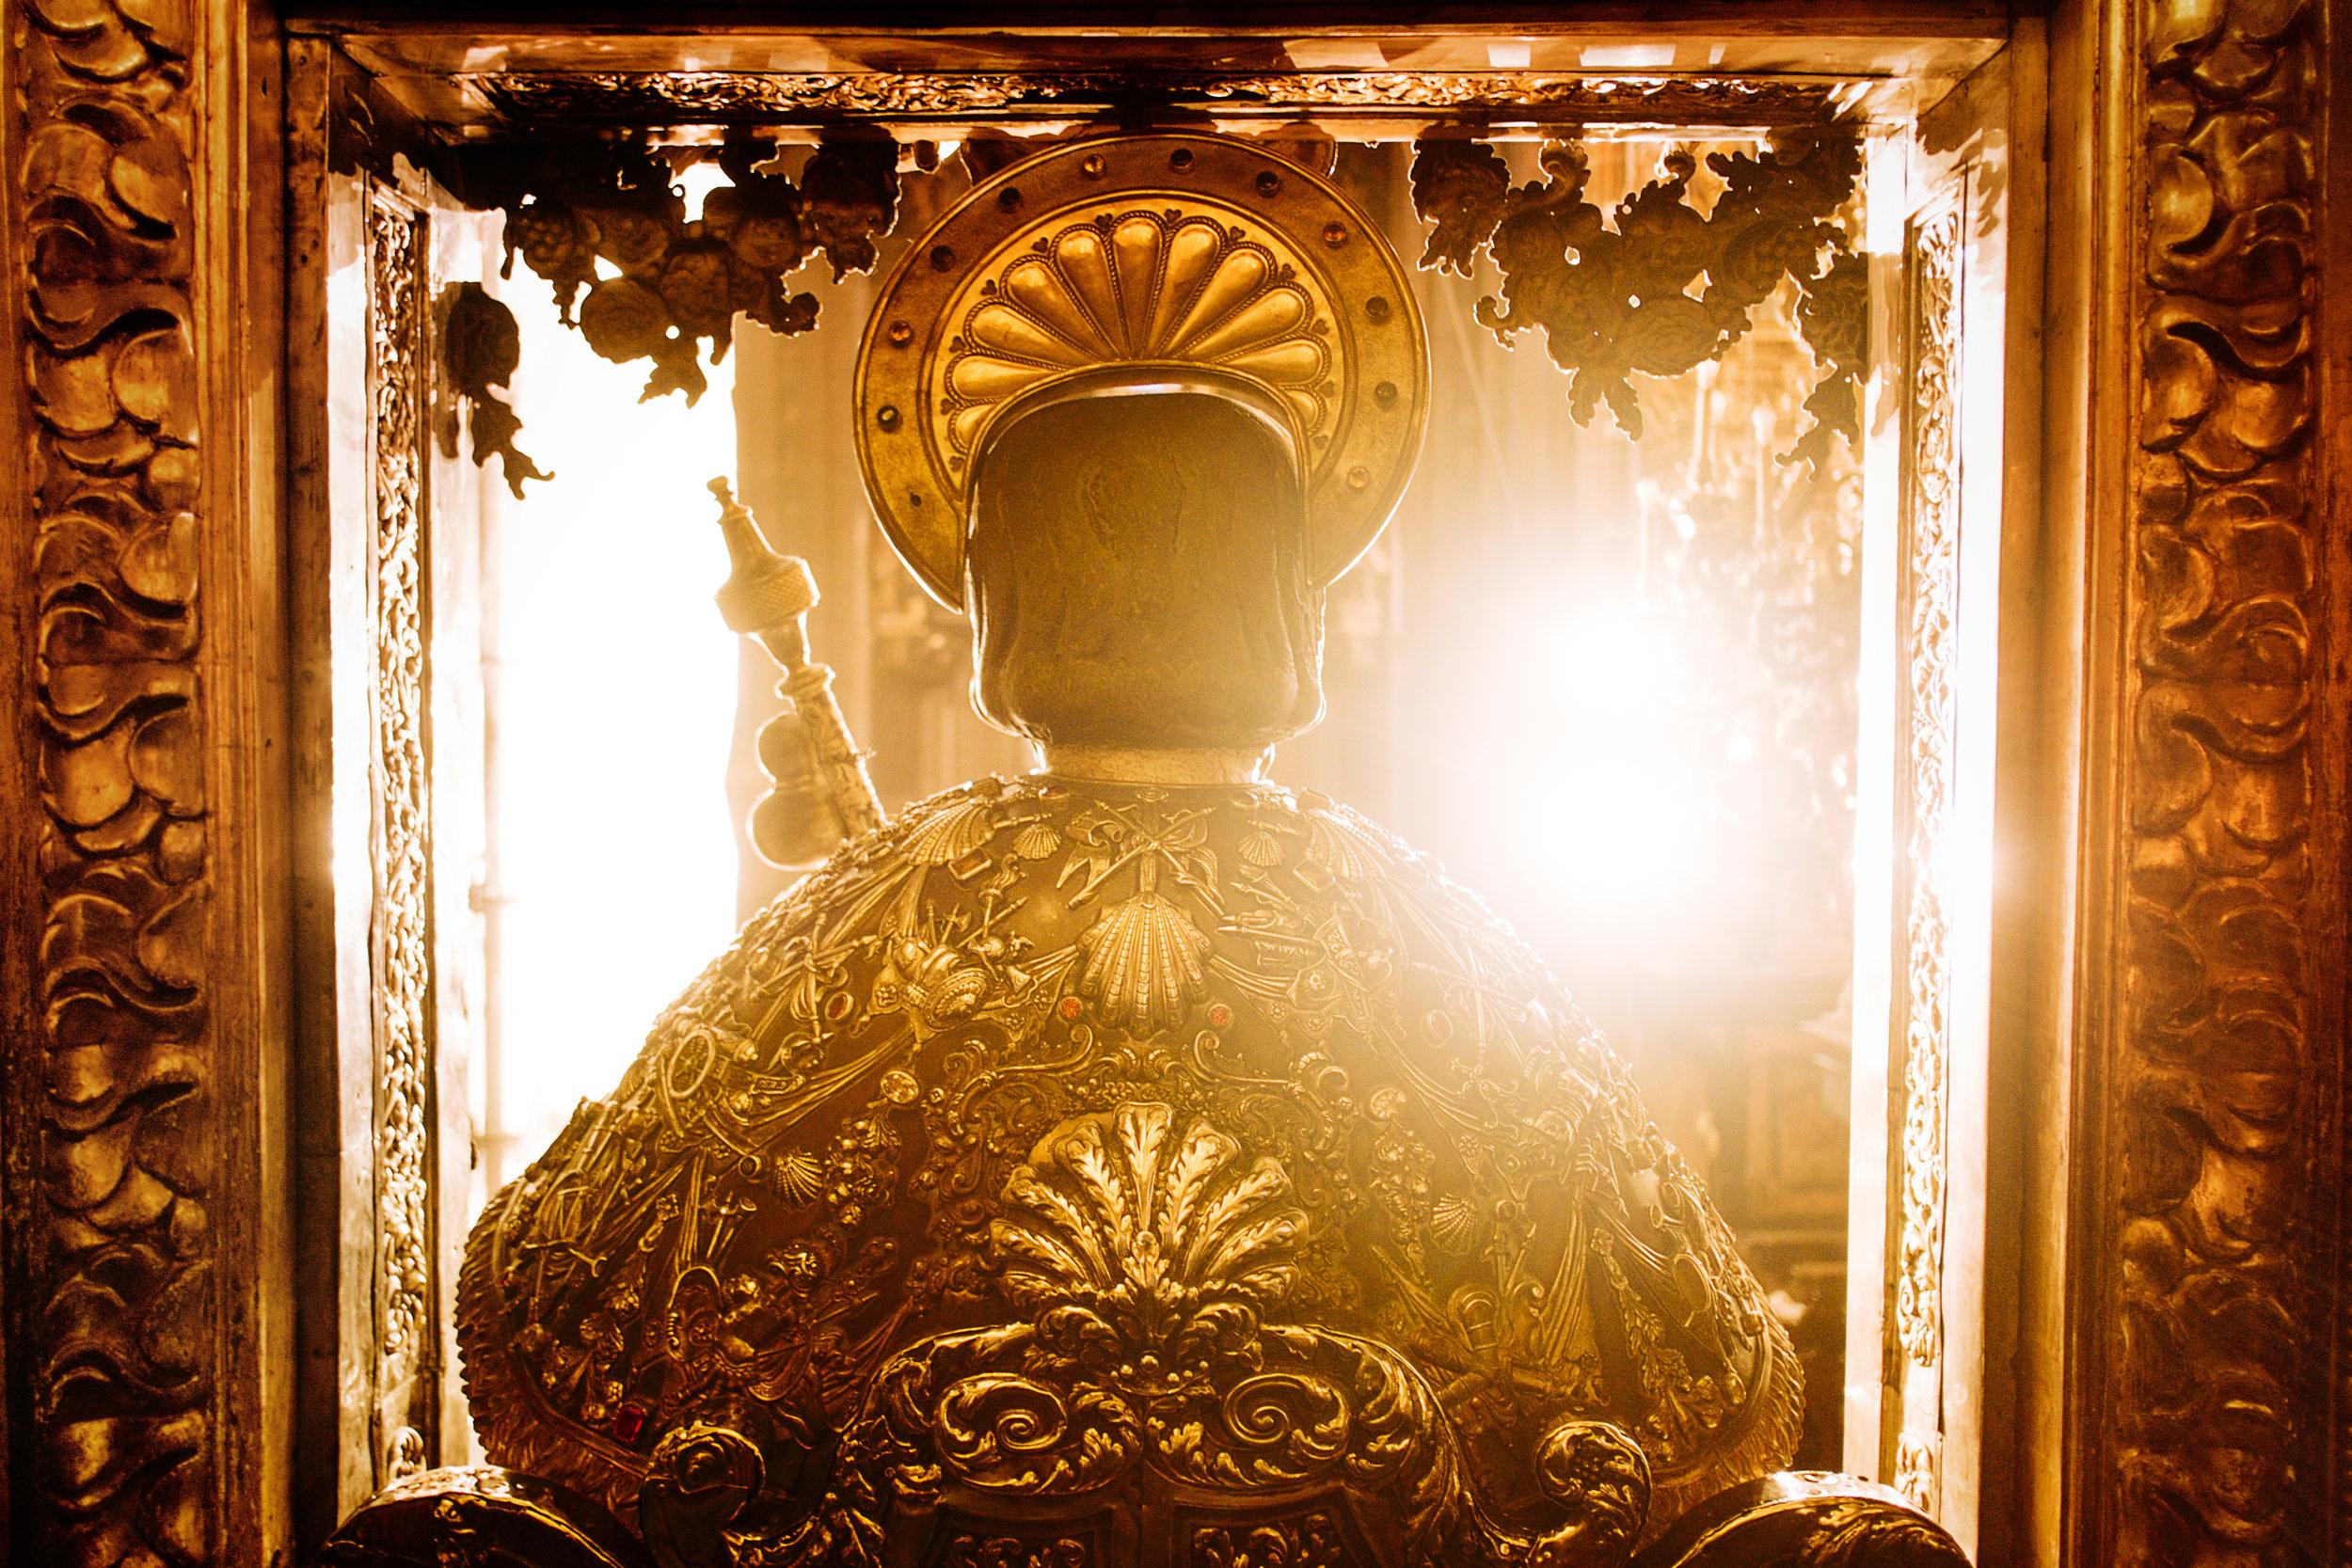 Liber Sancti Iacobi09.jpg